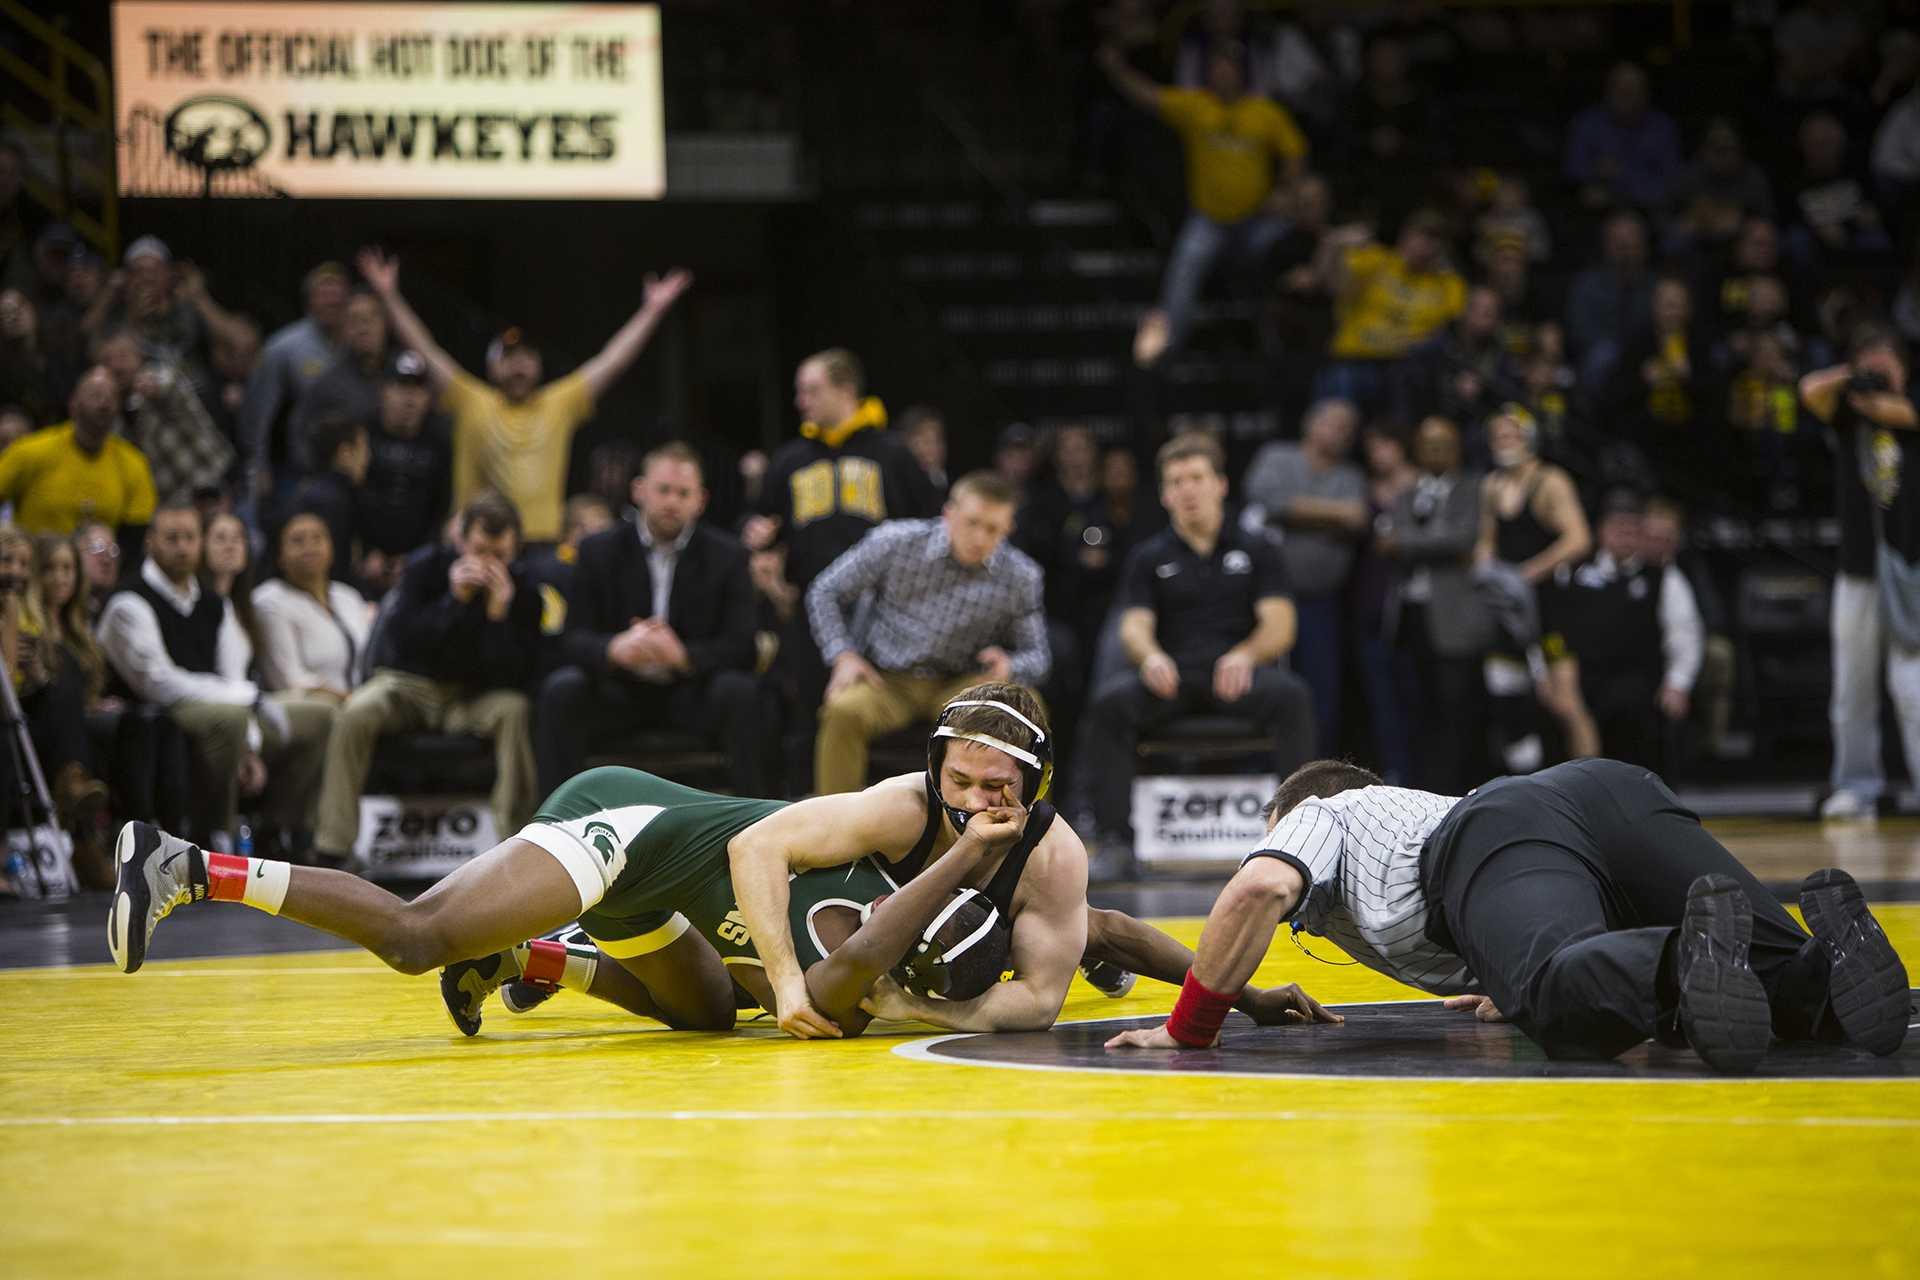 Iowa's six pins lead to pummeling of Michigan State